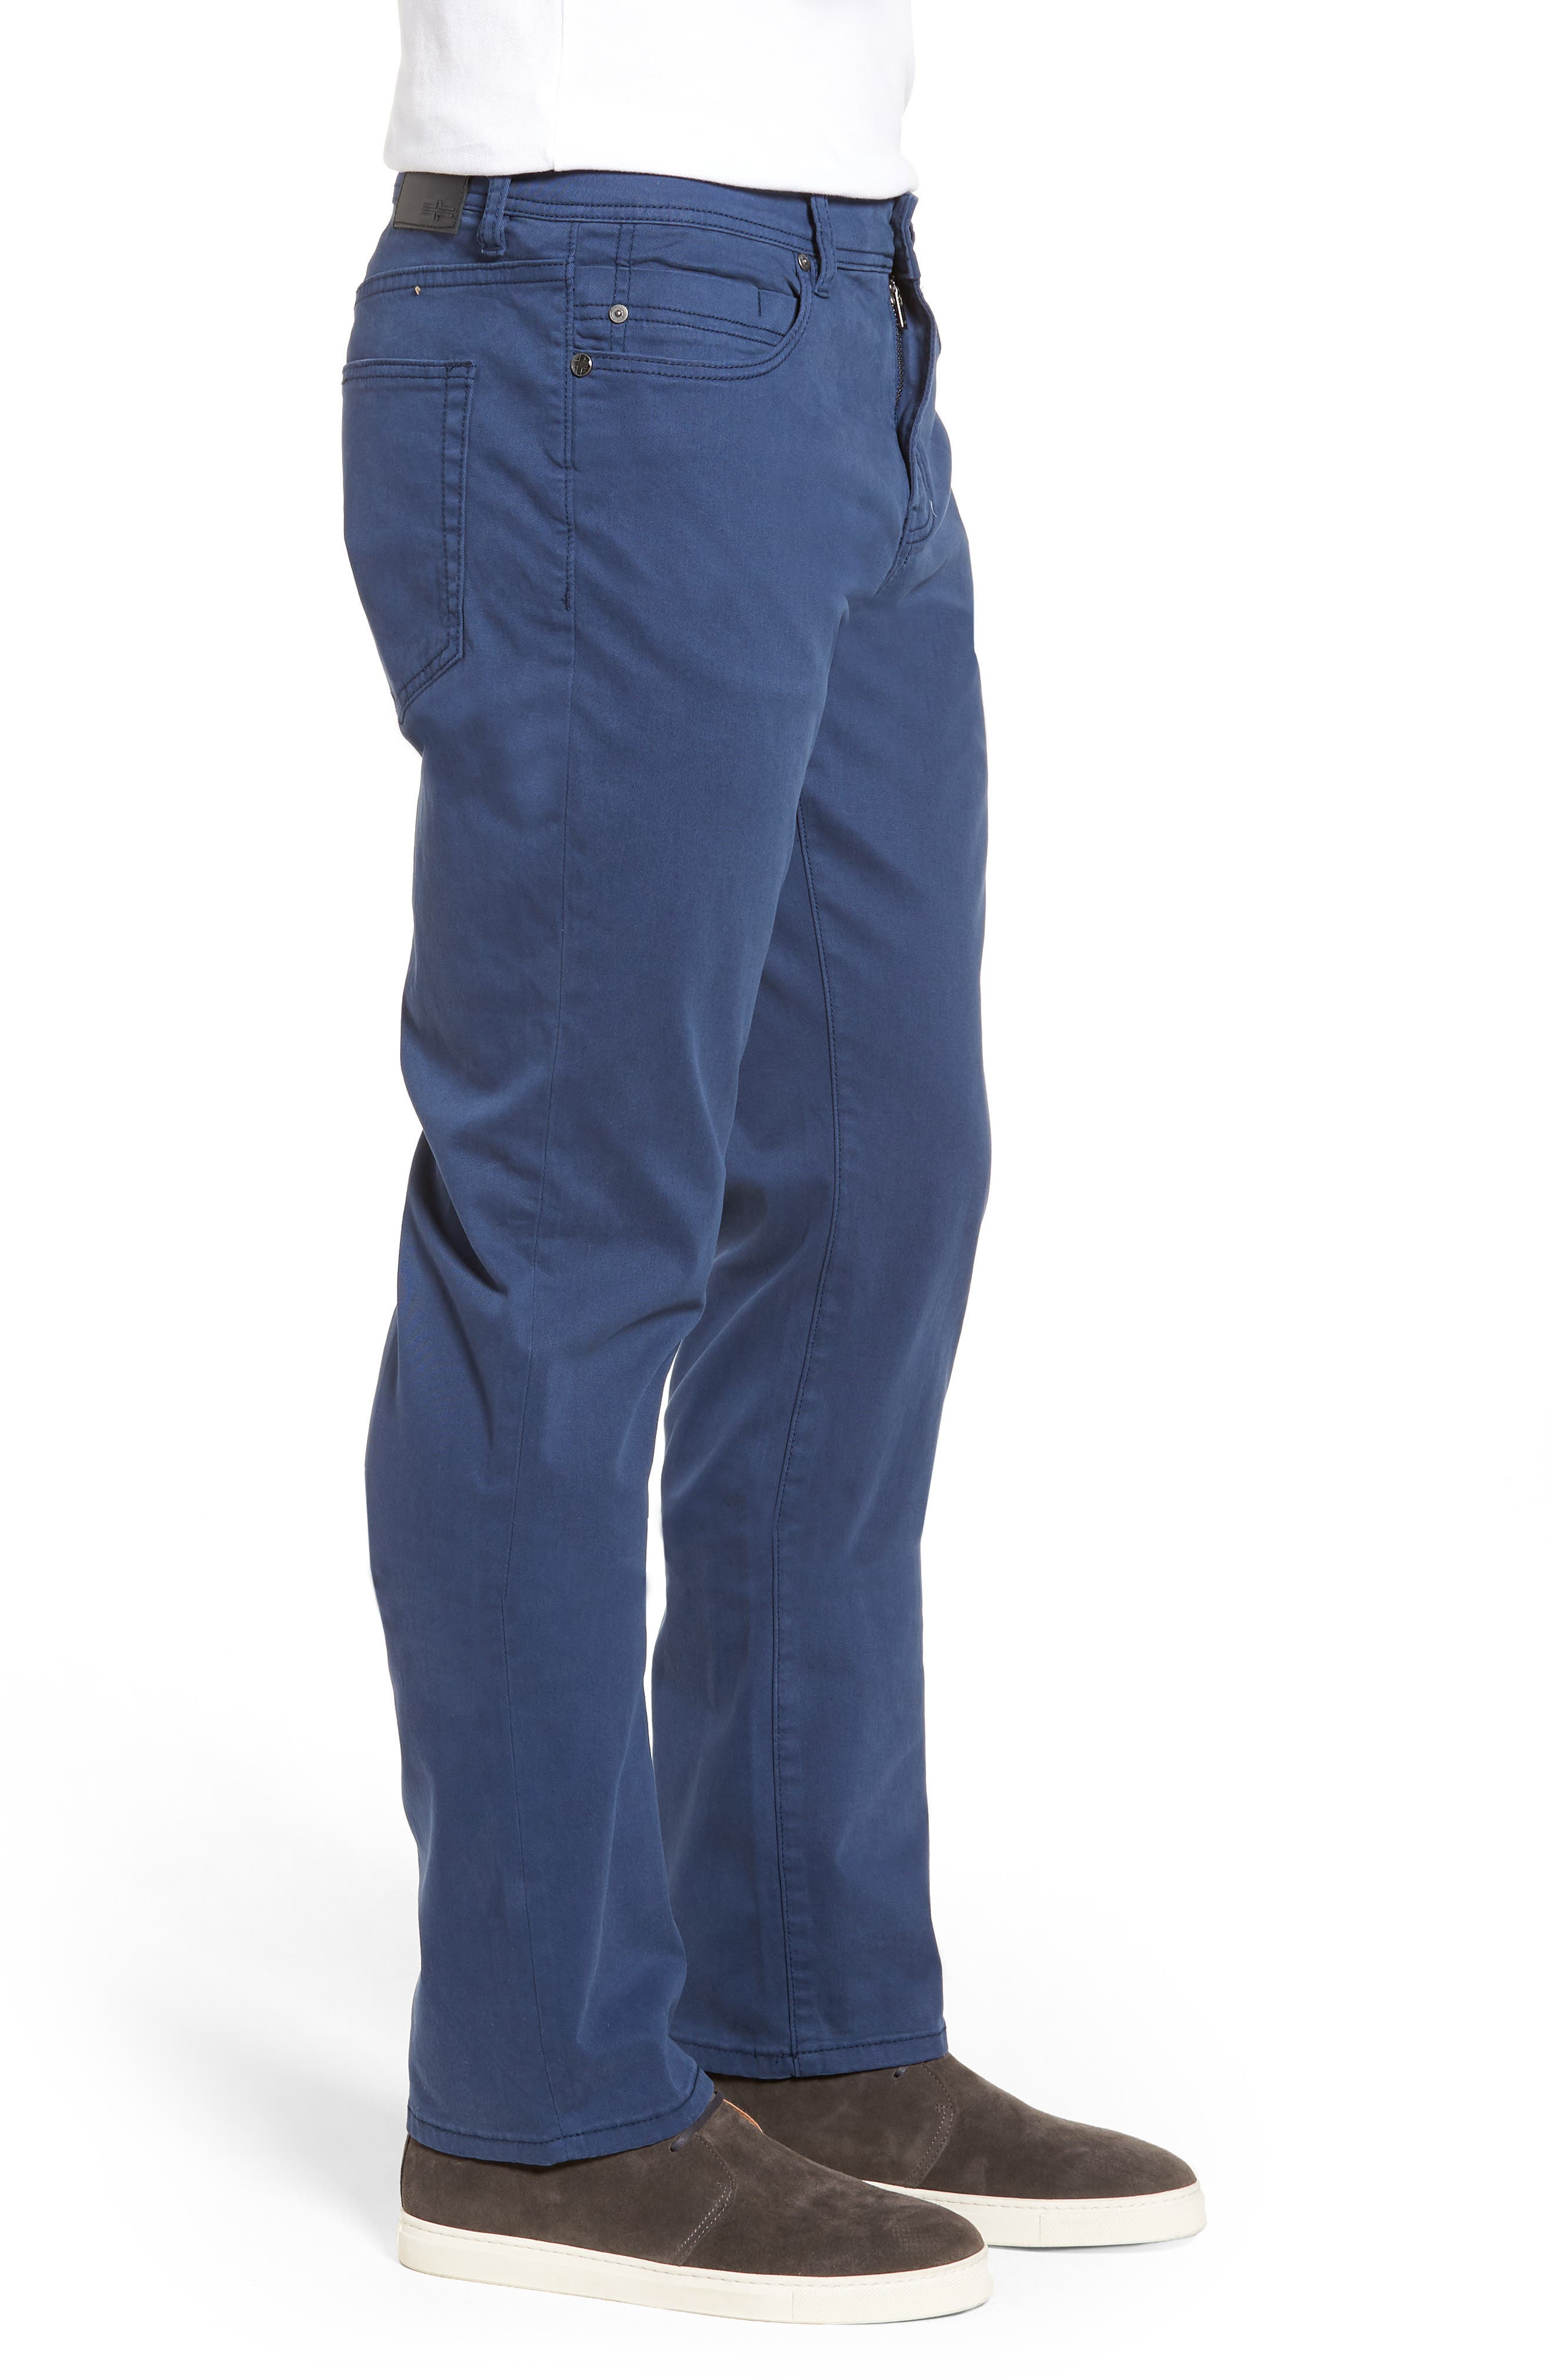 Jeans Co. Regent Relaxed Straight Leg Jeans,                             Alternate thumbnail 3, color,                             BLUE TWILIGHT